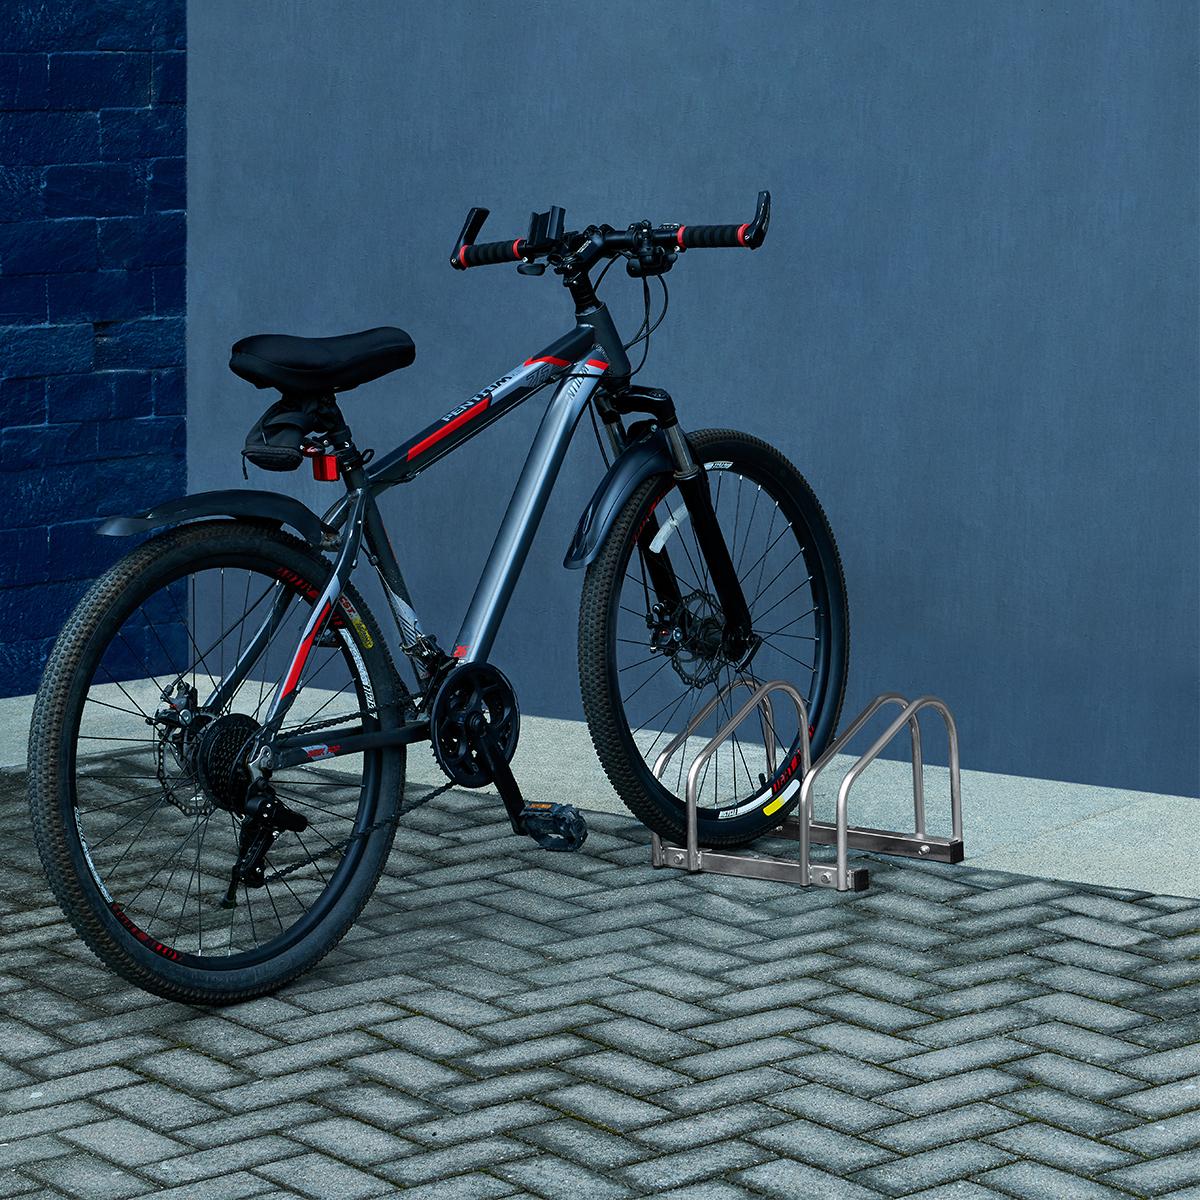 Bike Stand Cycle Bicycle Floor Wall Mount Galvanized Parking Storage Rack